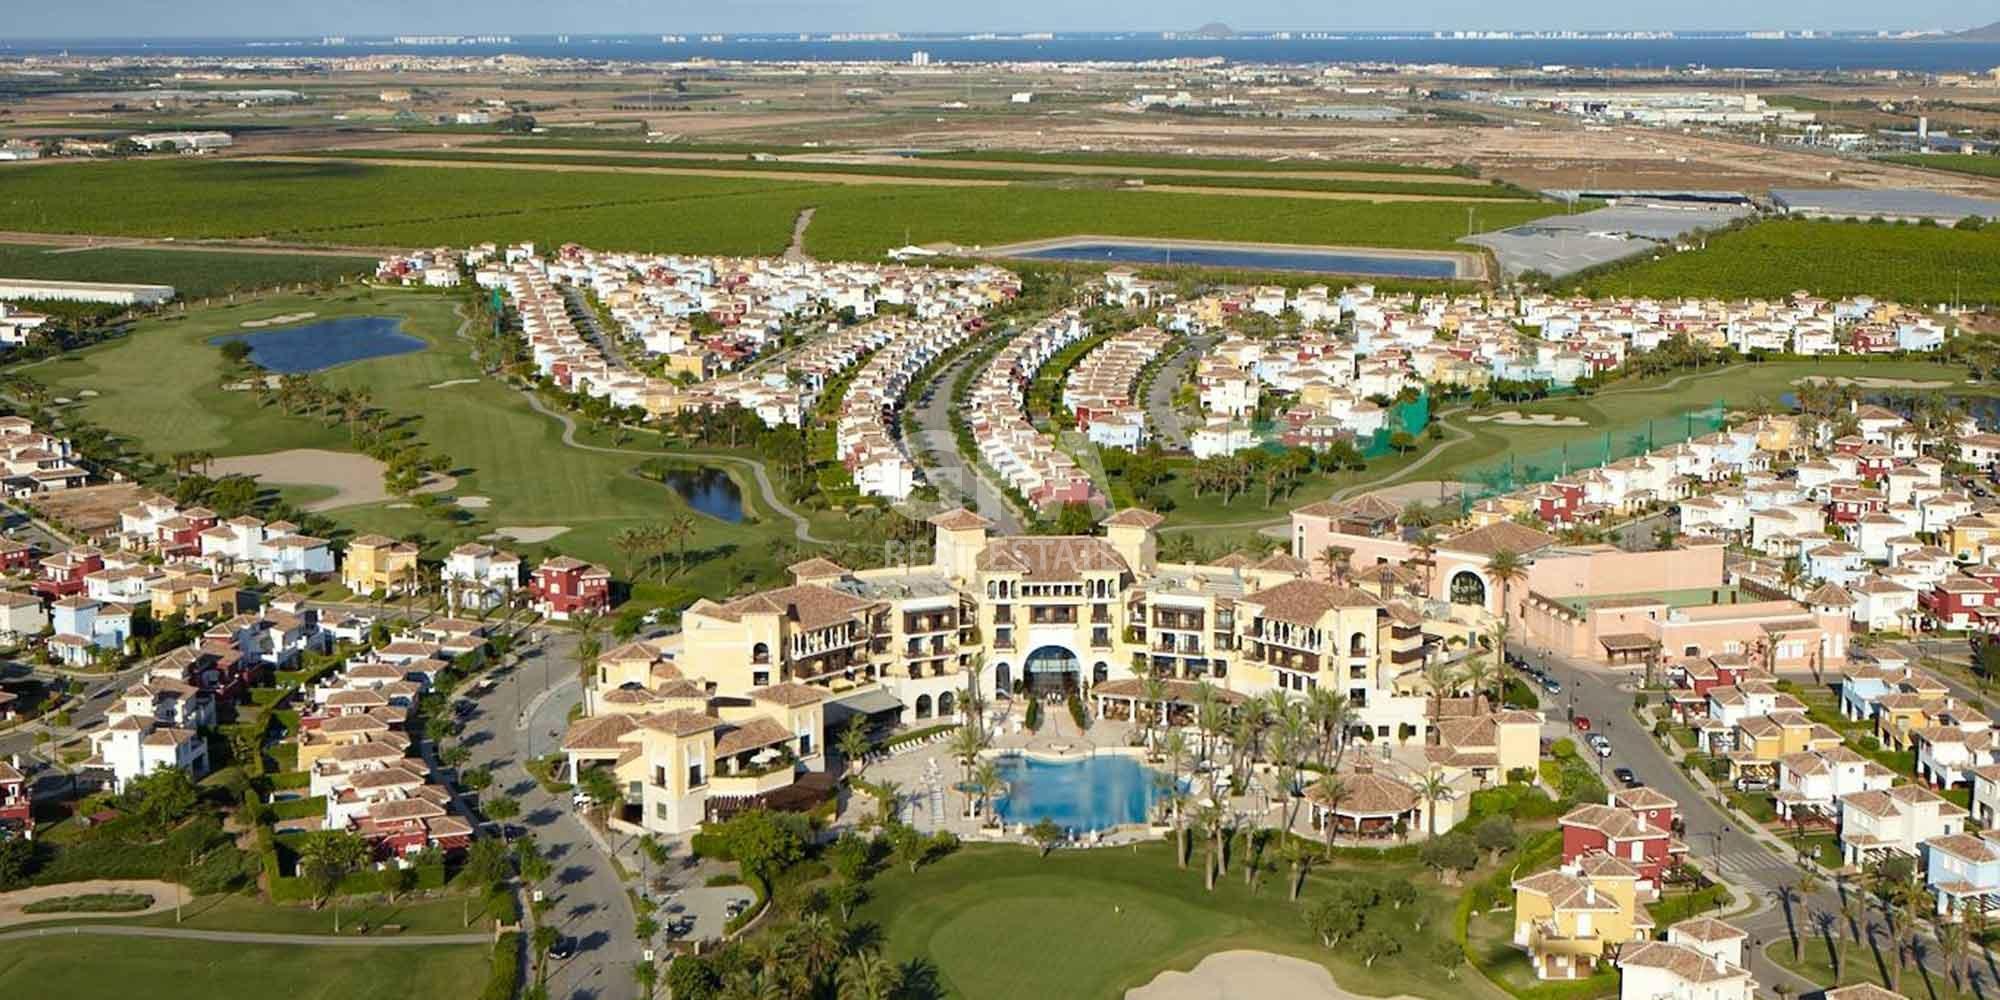 Residencial obra nueva Mar Menor Golf Resort vista aérea